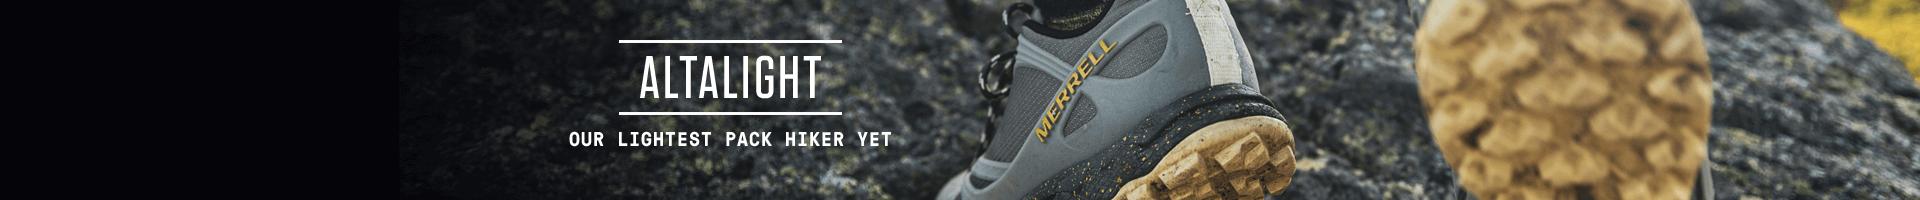 Merrell grey Altalight pack hiker shoes.